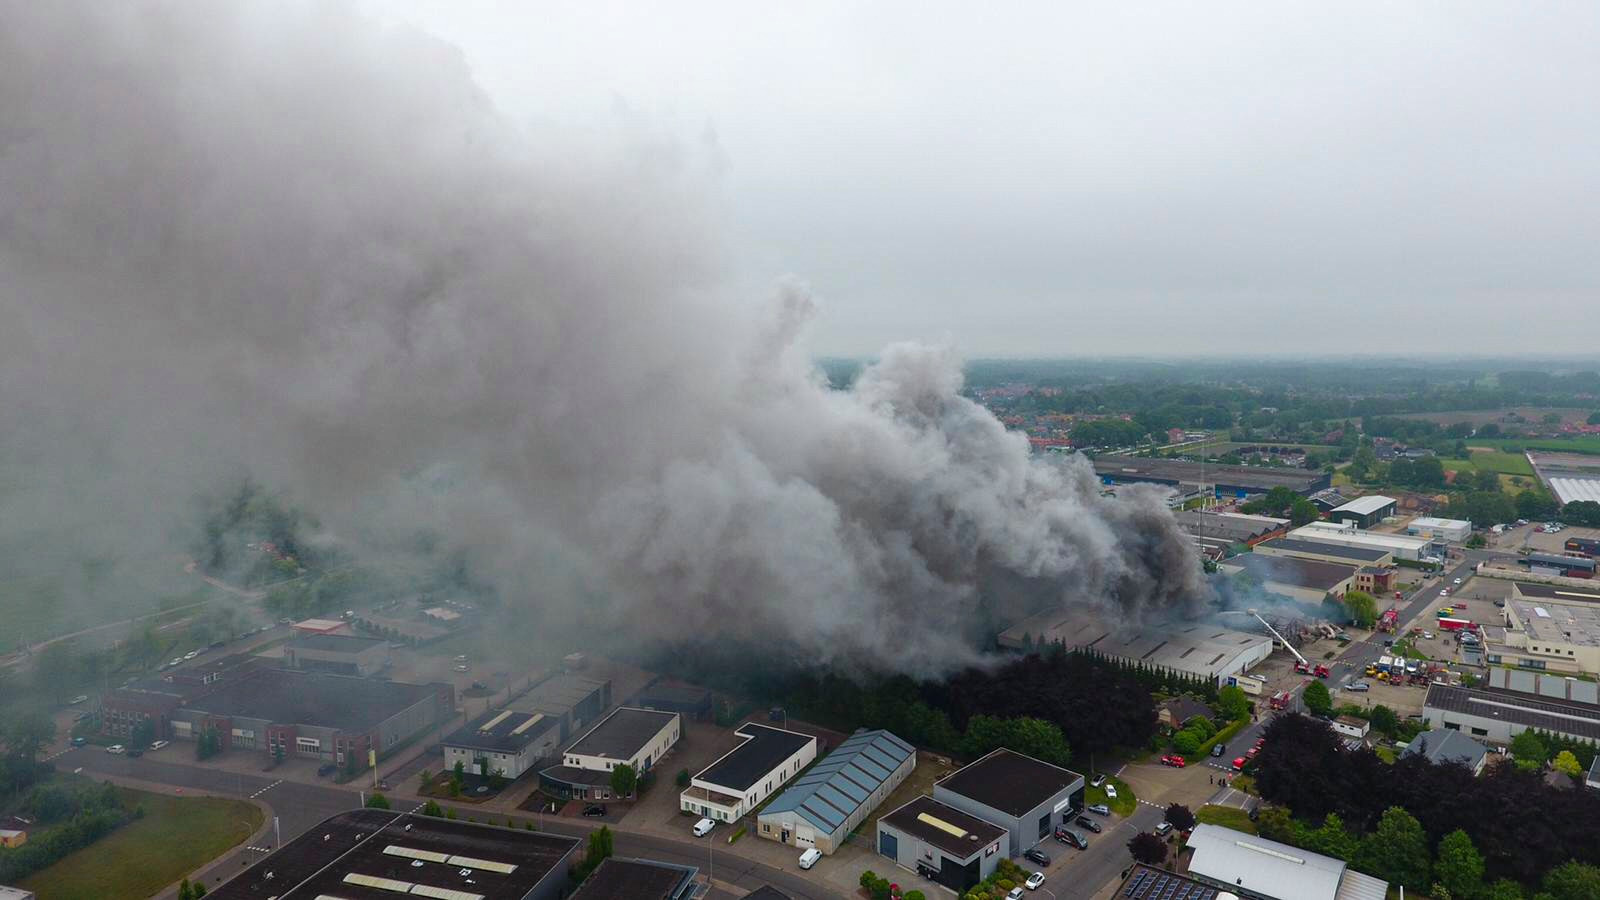 De grote brand die woedde op industrieterrein Werkveld in Vorden.